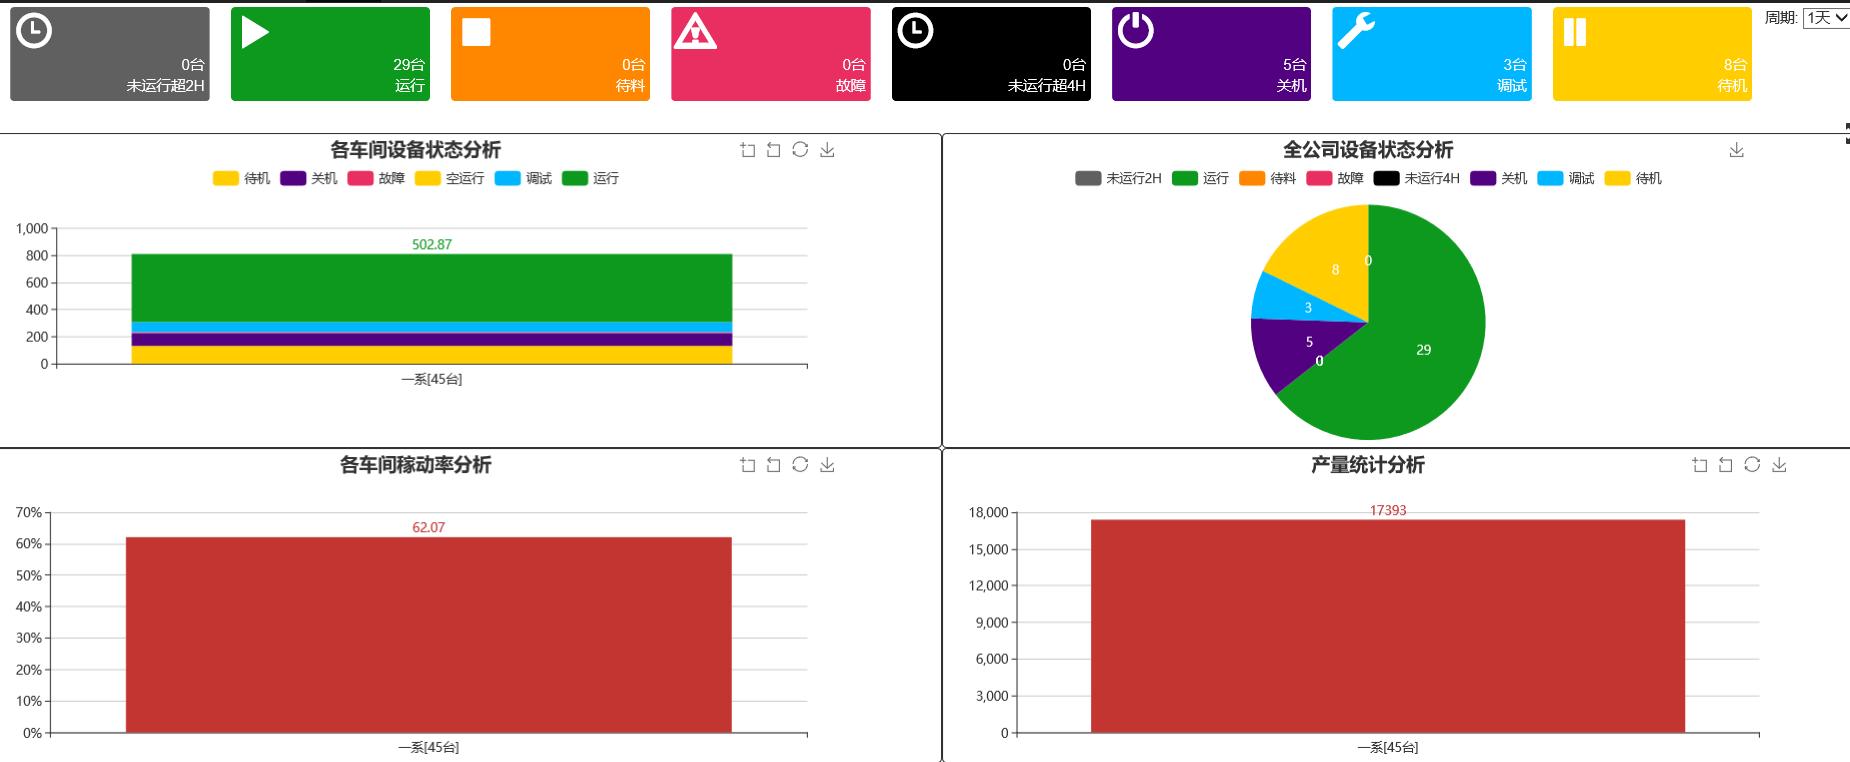 CNC远程数采集,哪一家公司做机床监控比较好,哪家公司做MDC采集时间比较久,设备稼动率统计,苏州易智公司,苏州自动化公司